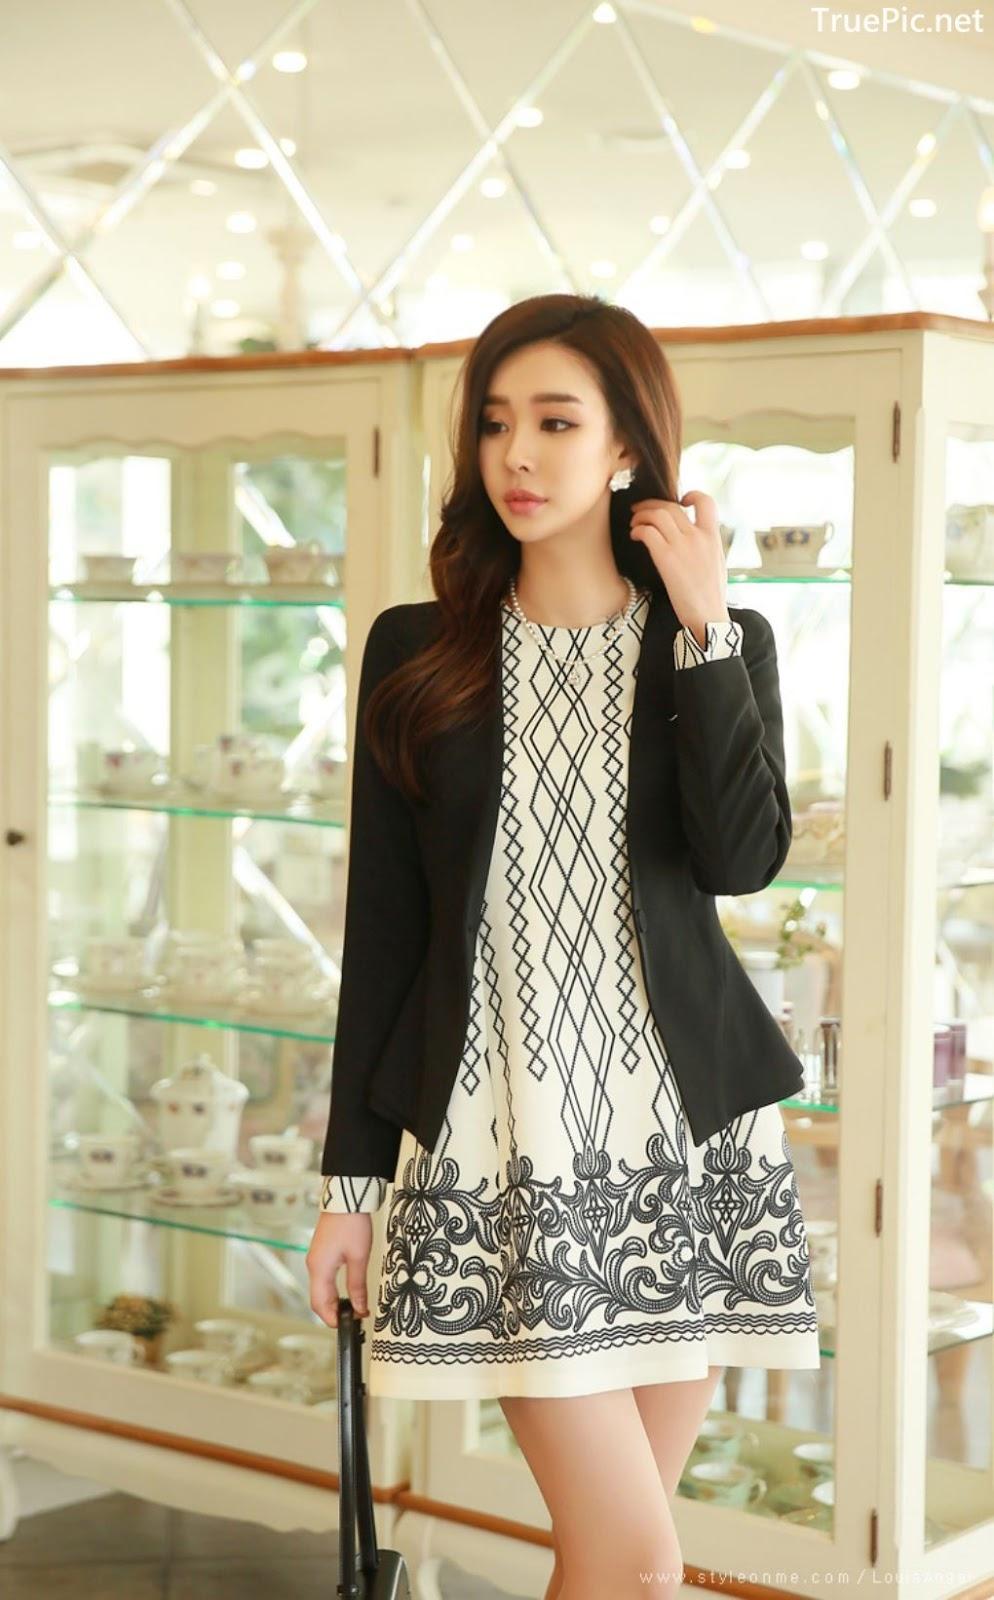 Image-Korean-Fashion-Model-Park-Da-Hyun-Office-Dress-Collection-TruePic.net- Picture-9